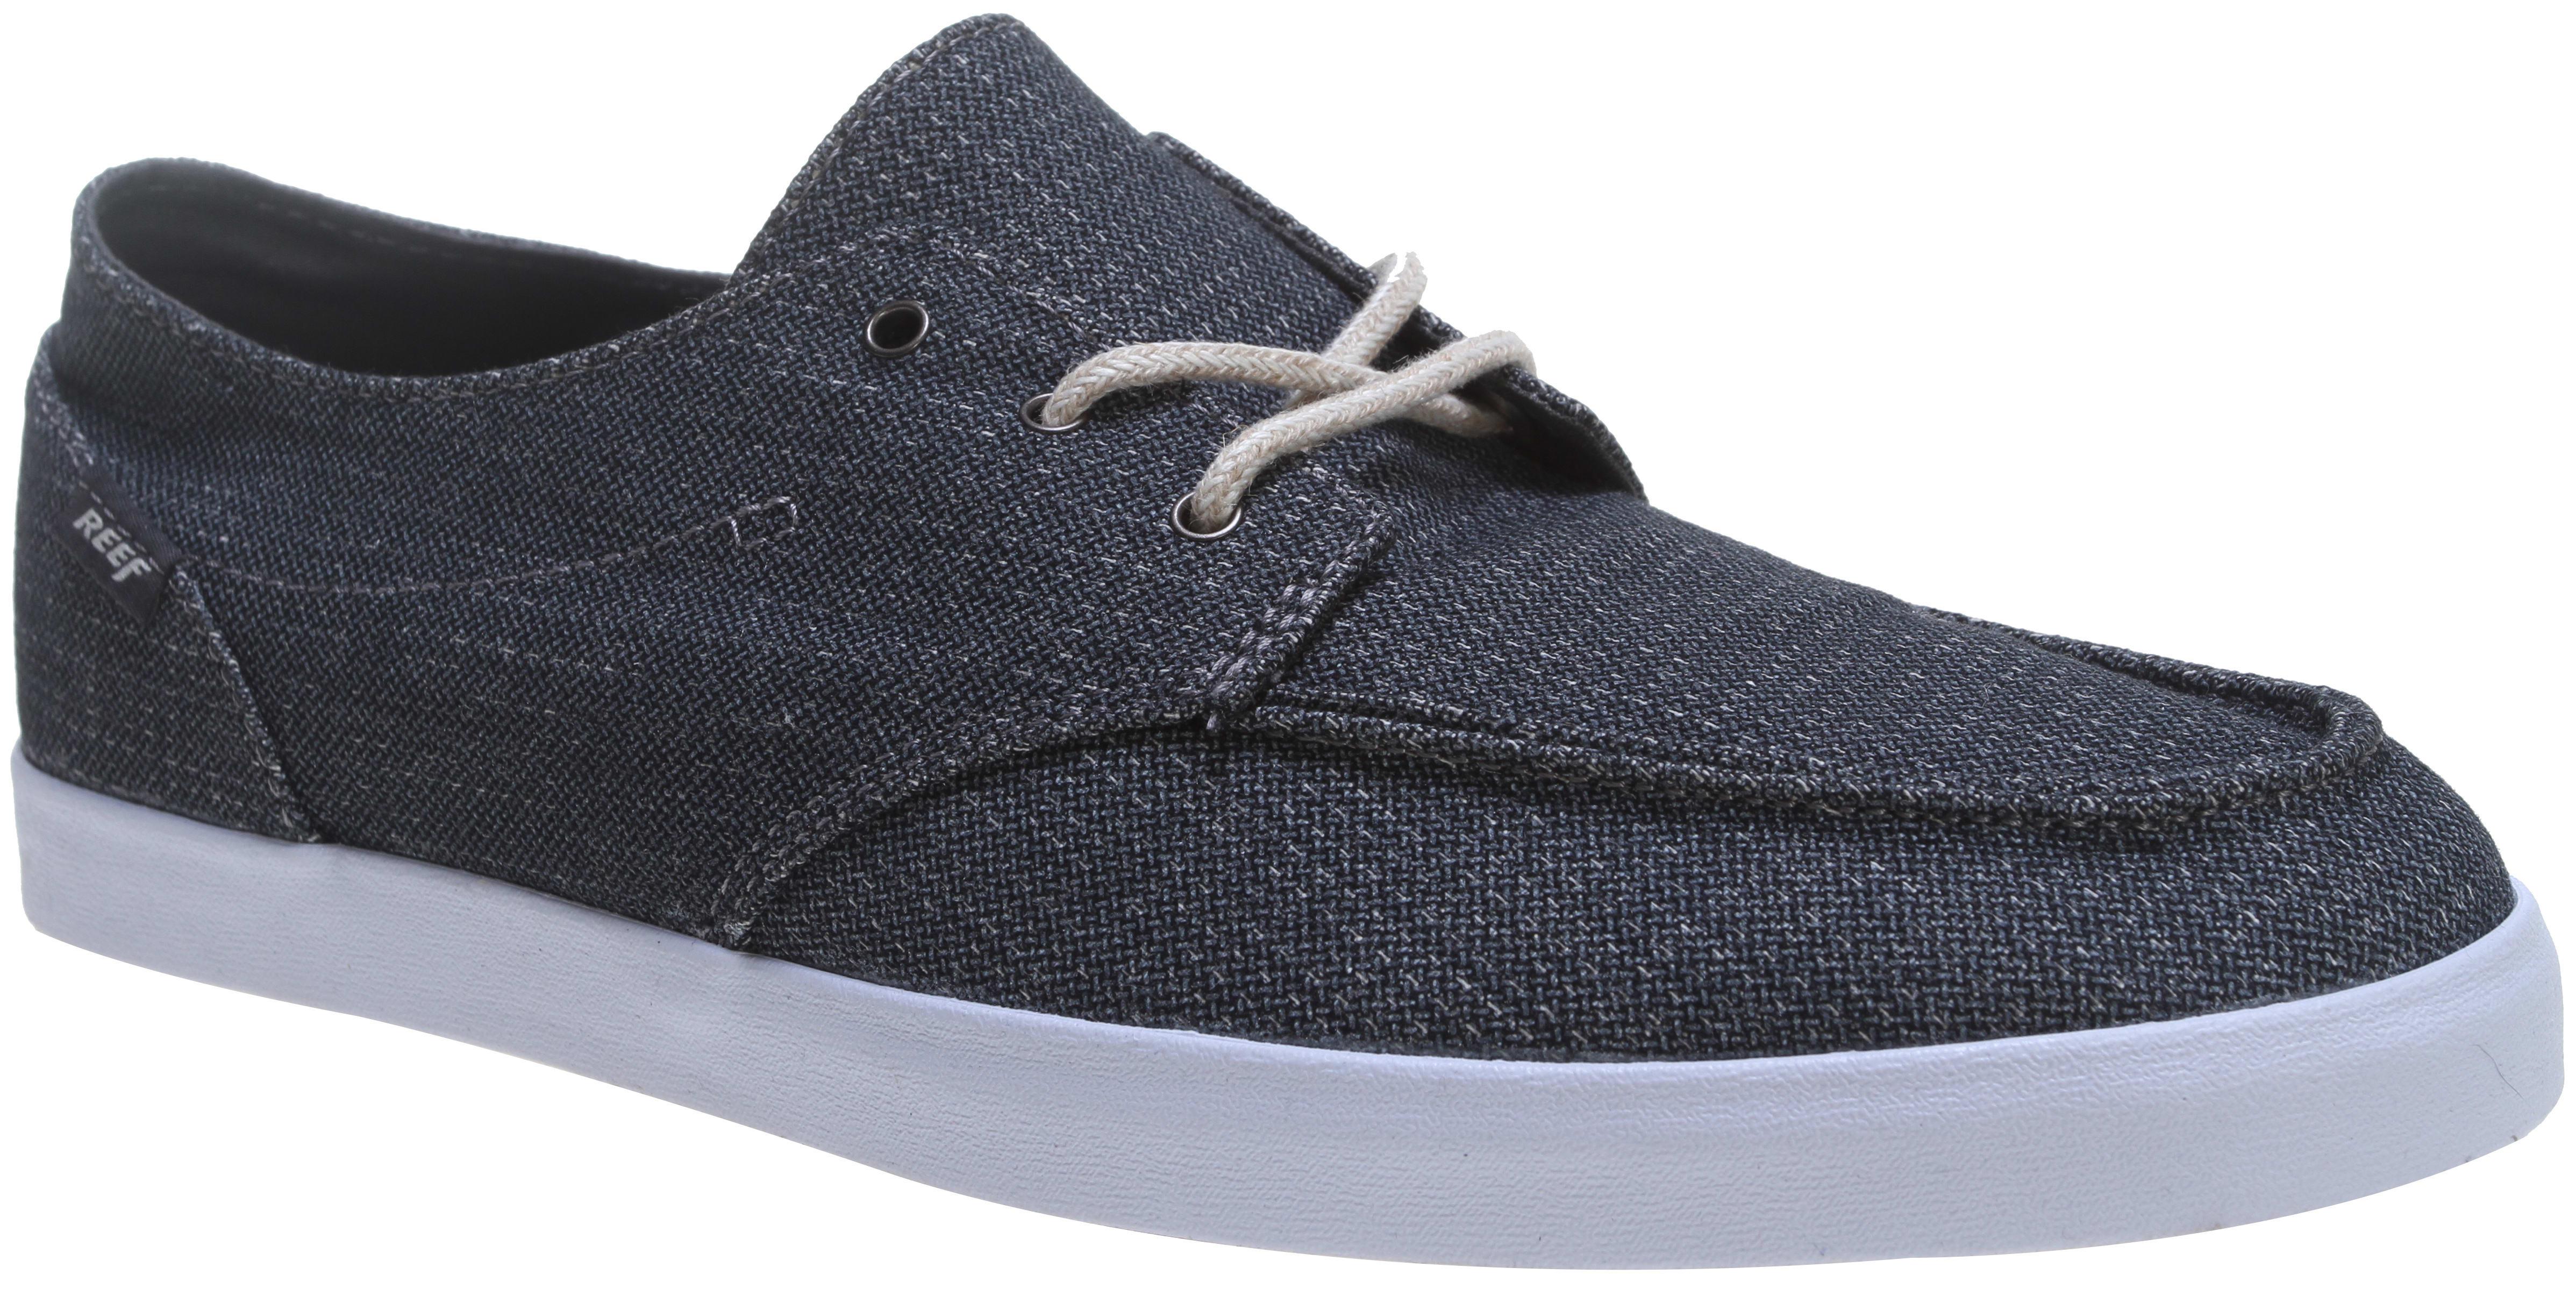 142614159dc80 Reef Deck Hand 2 TX Shoes - thumbnail 2